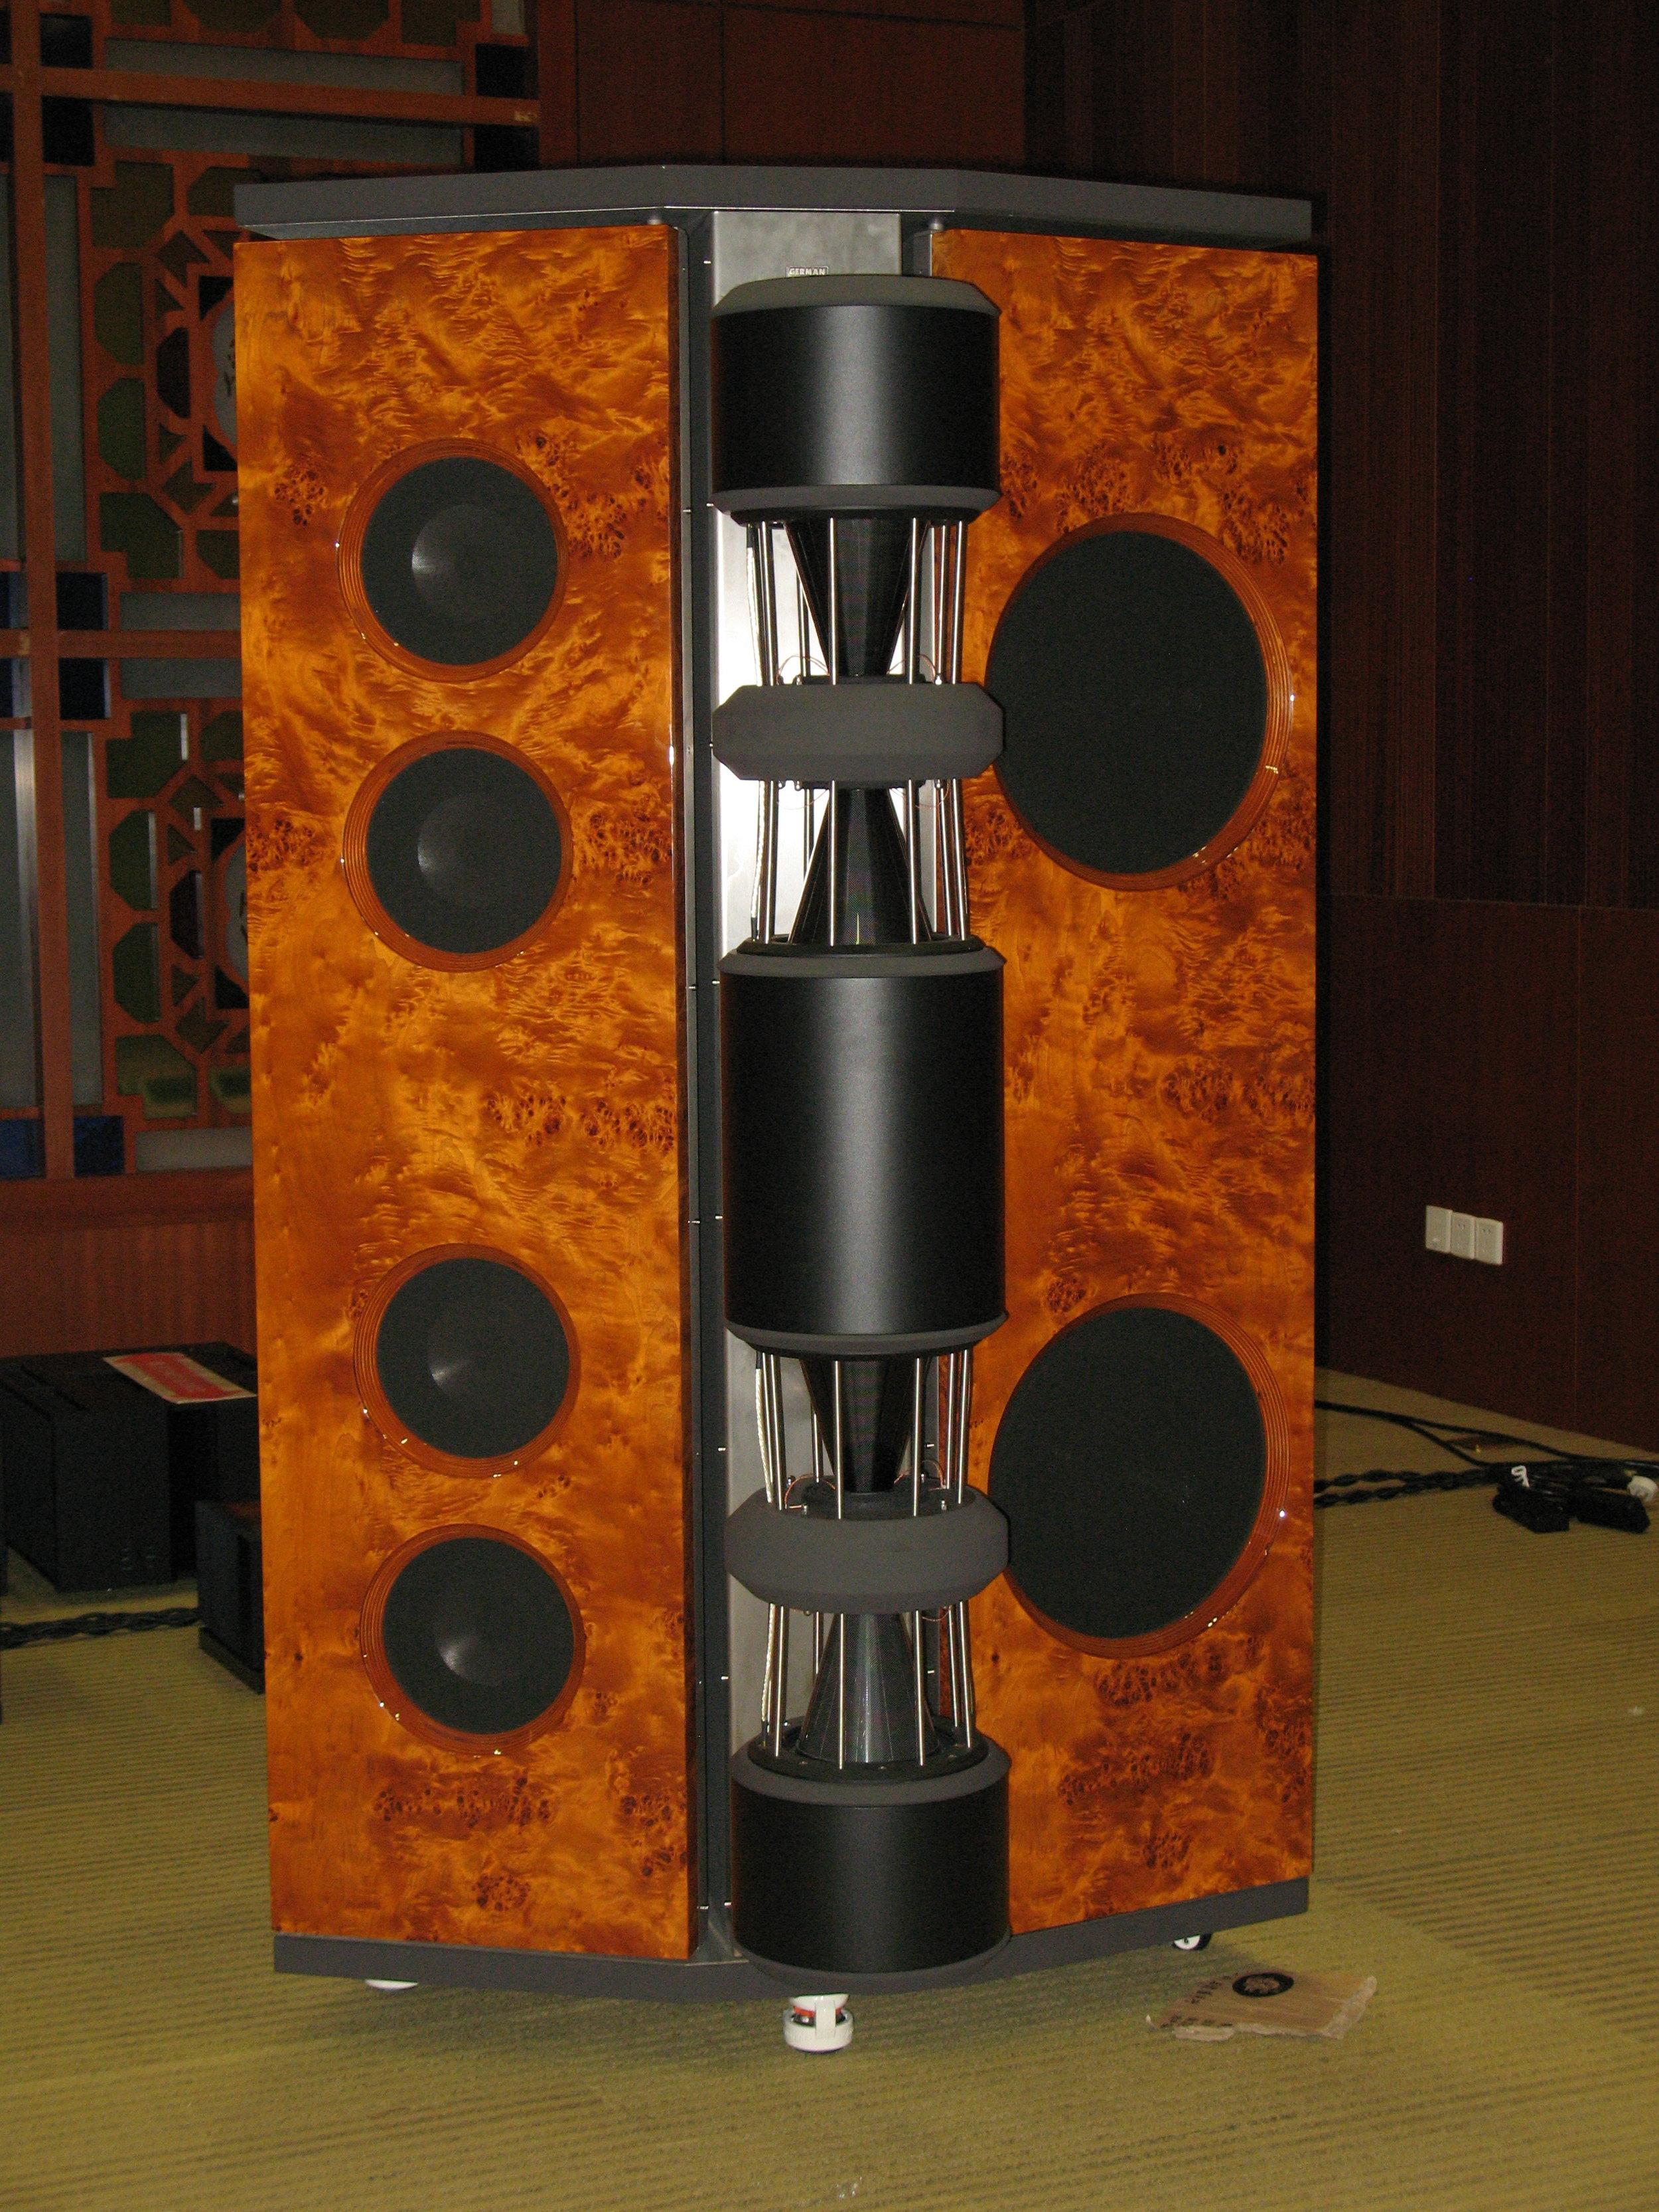 Emperor MK II loudspeaker in papple cluster | Guangzhou Show 2009, China